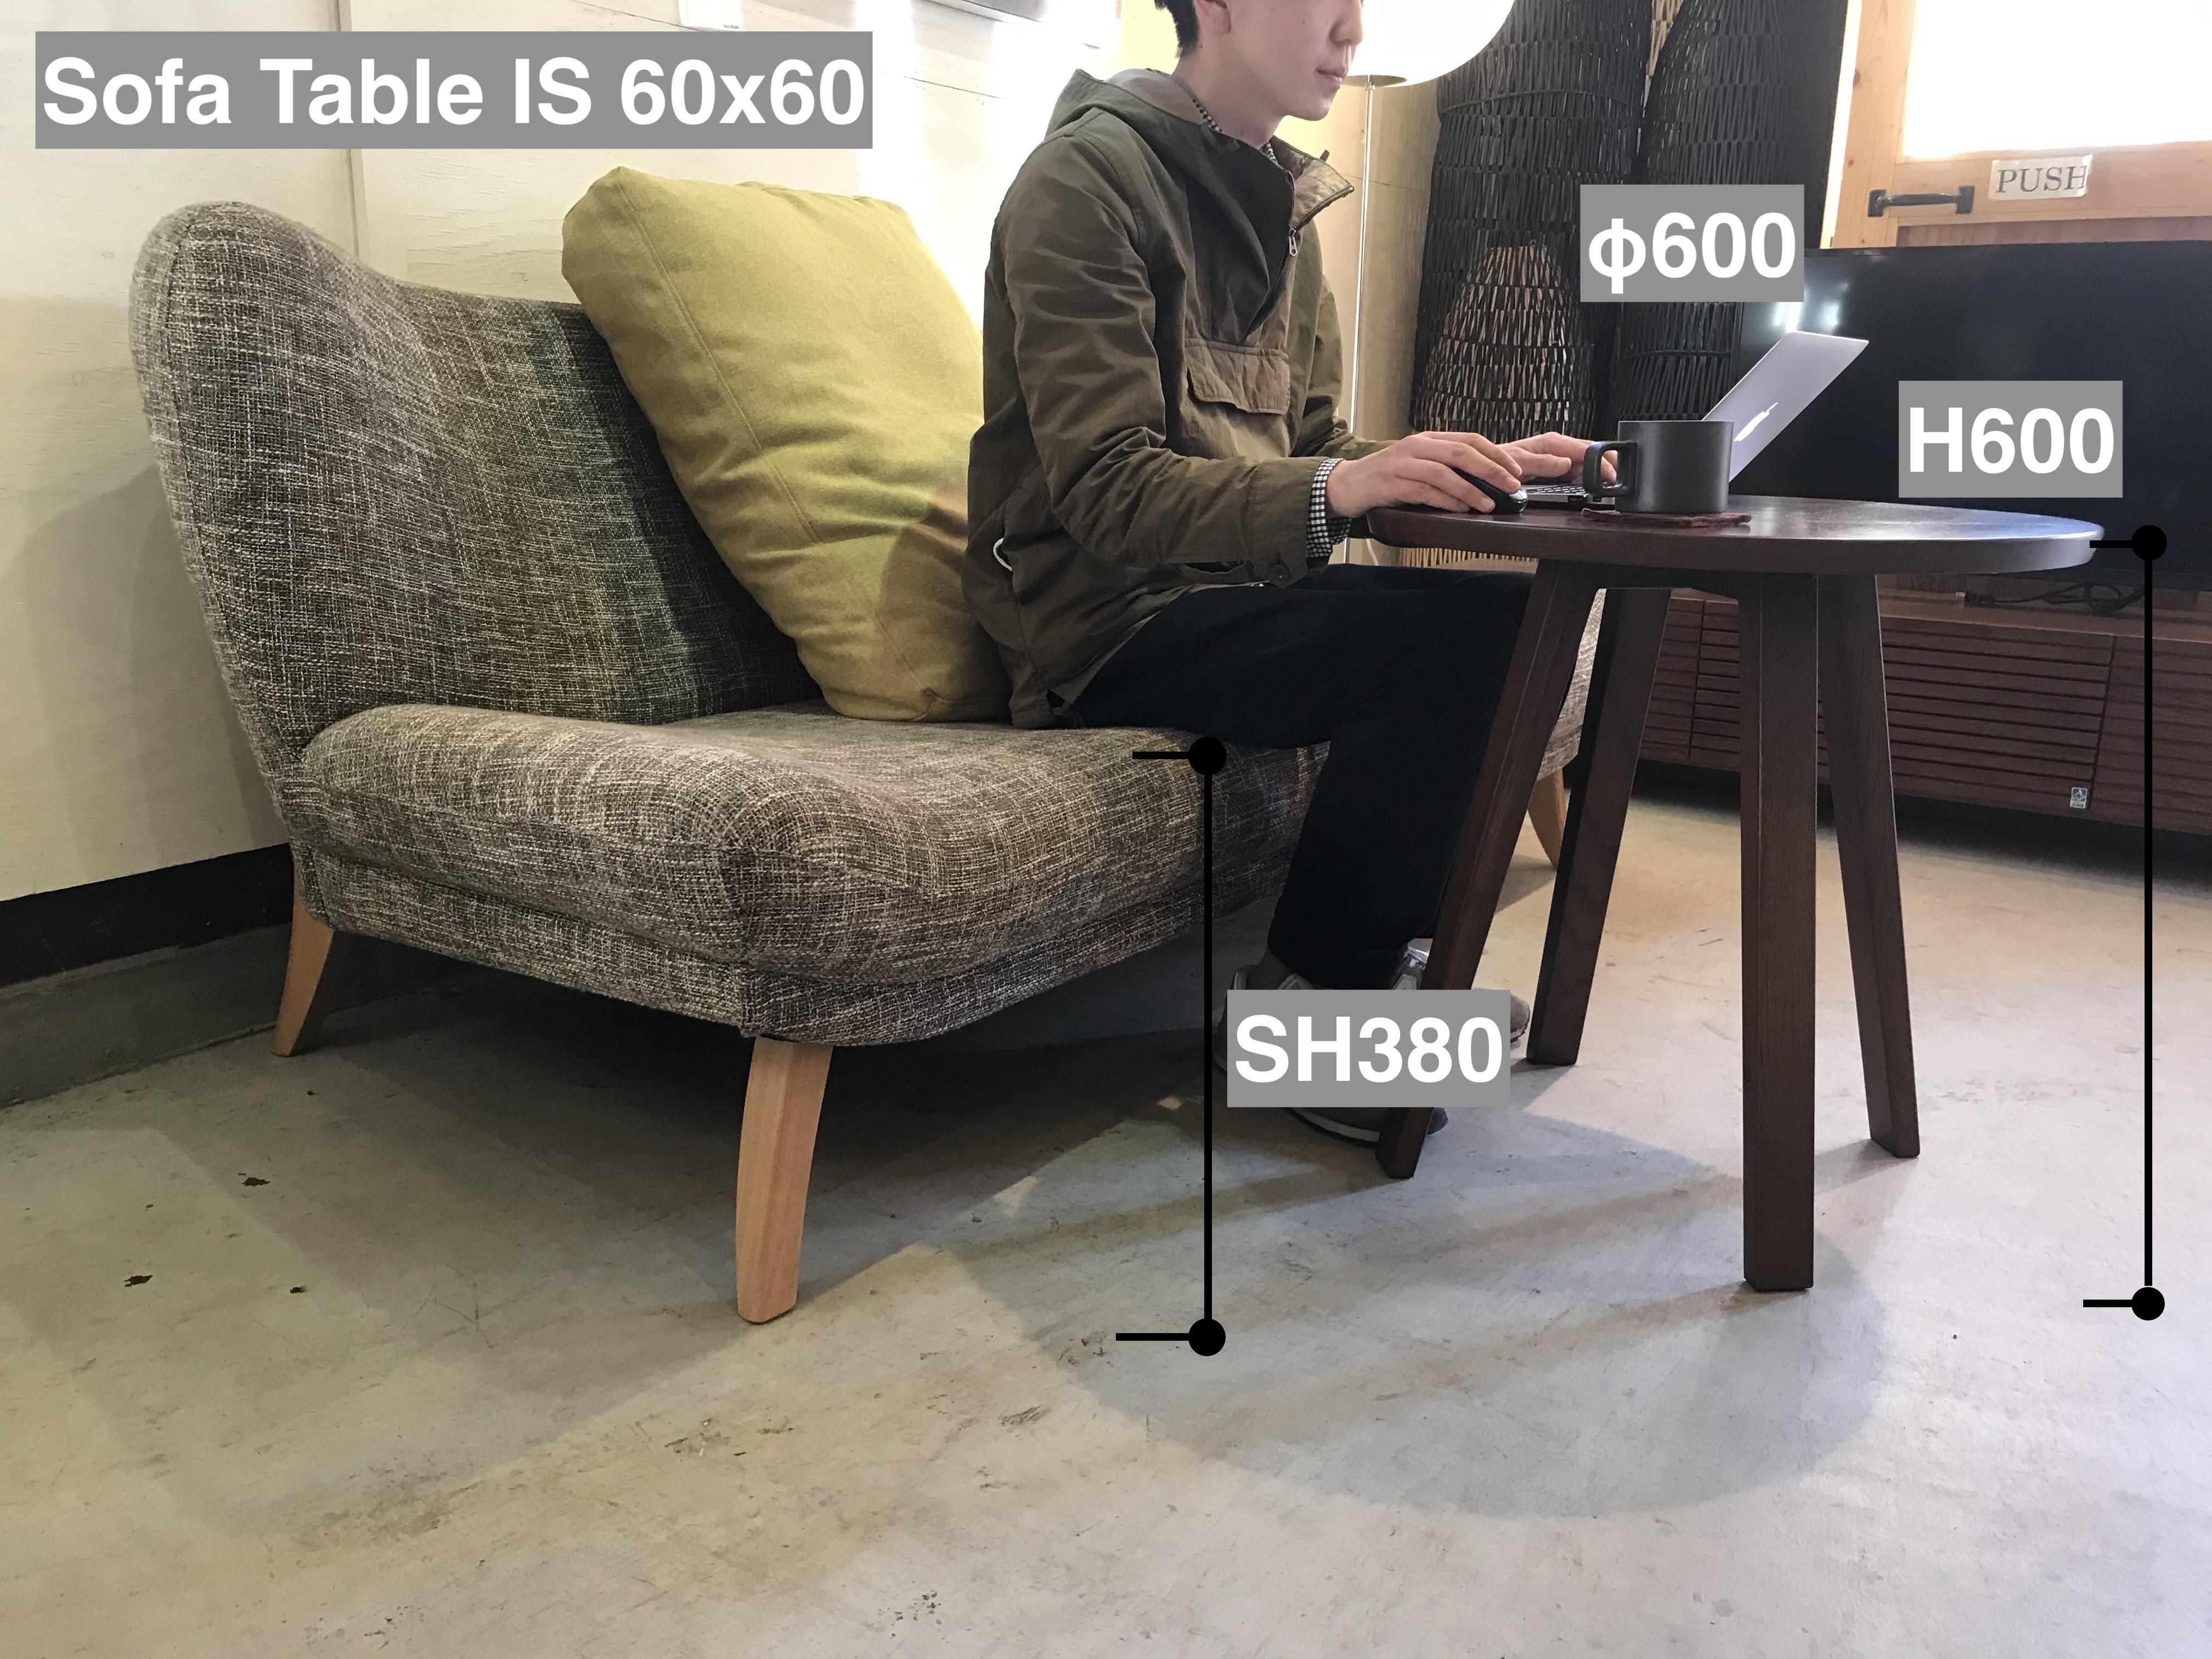 Sofa Table IS 60x60 サイズ